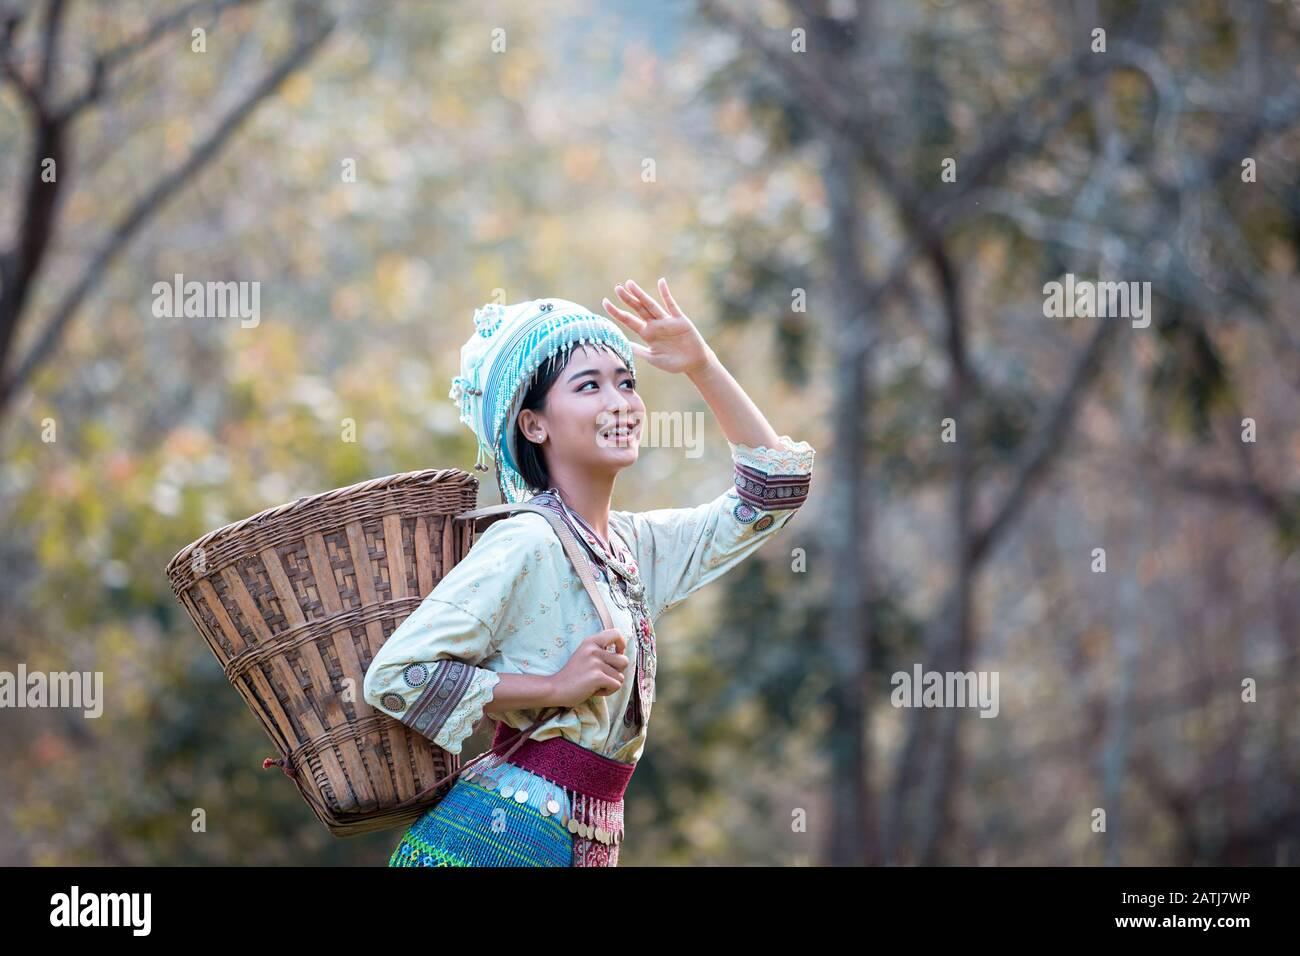 Young woman wearing Hmong traditional dress and enjoying the coffee garden at Doi Pui Chiang Mai Thailand. Stock Photo